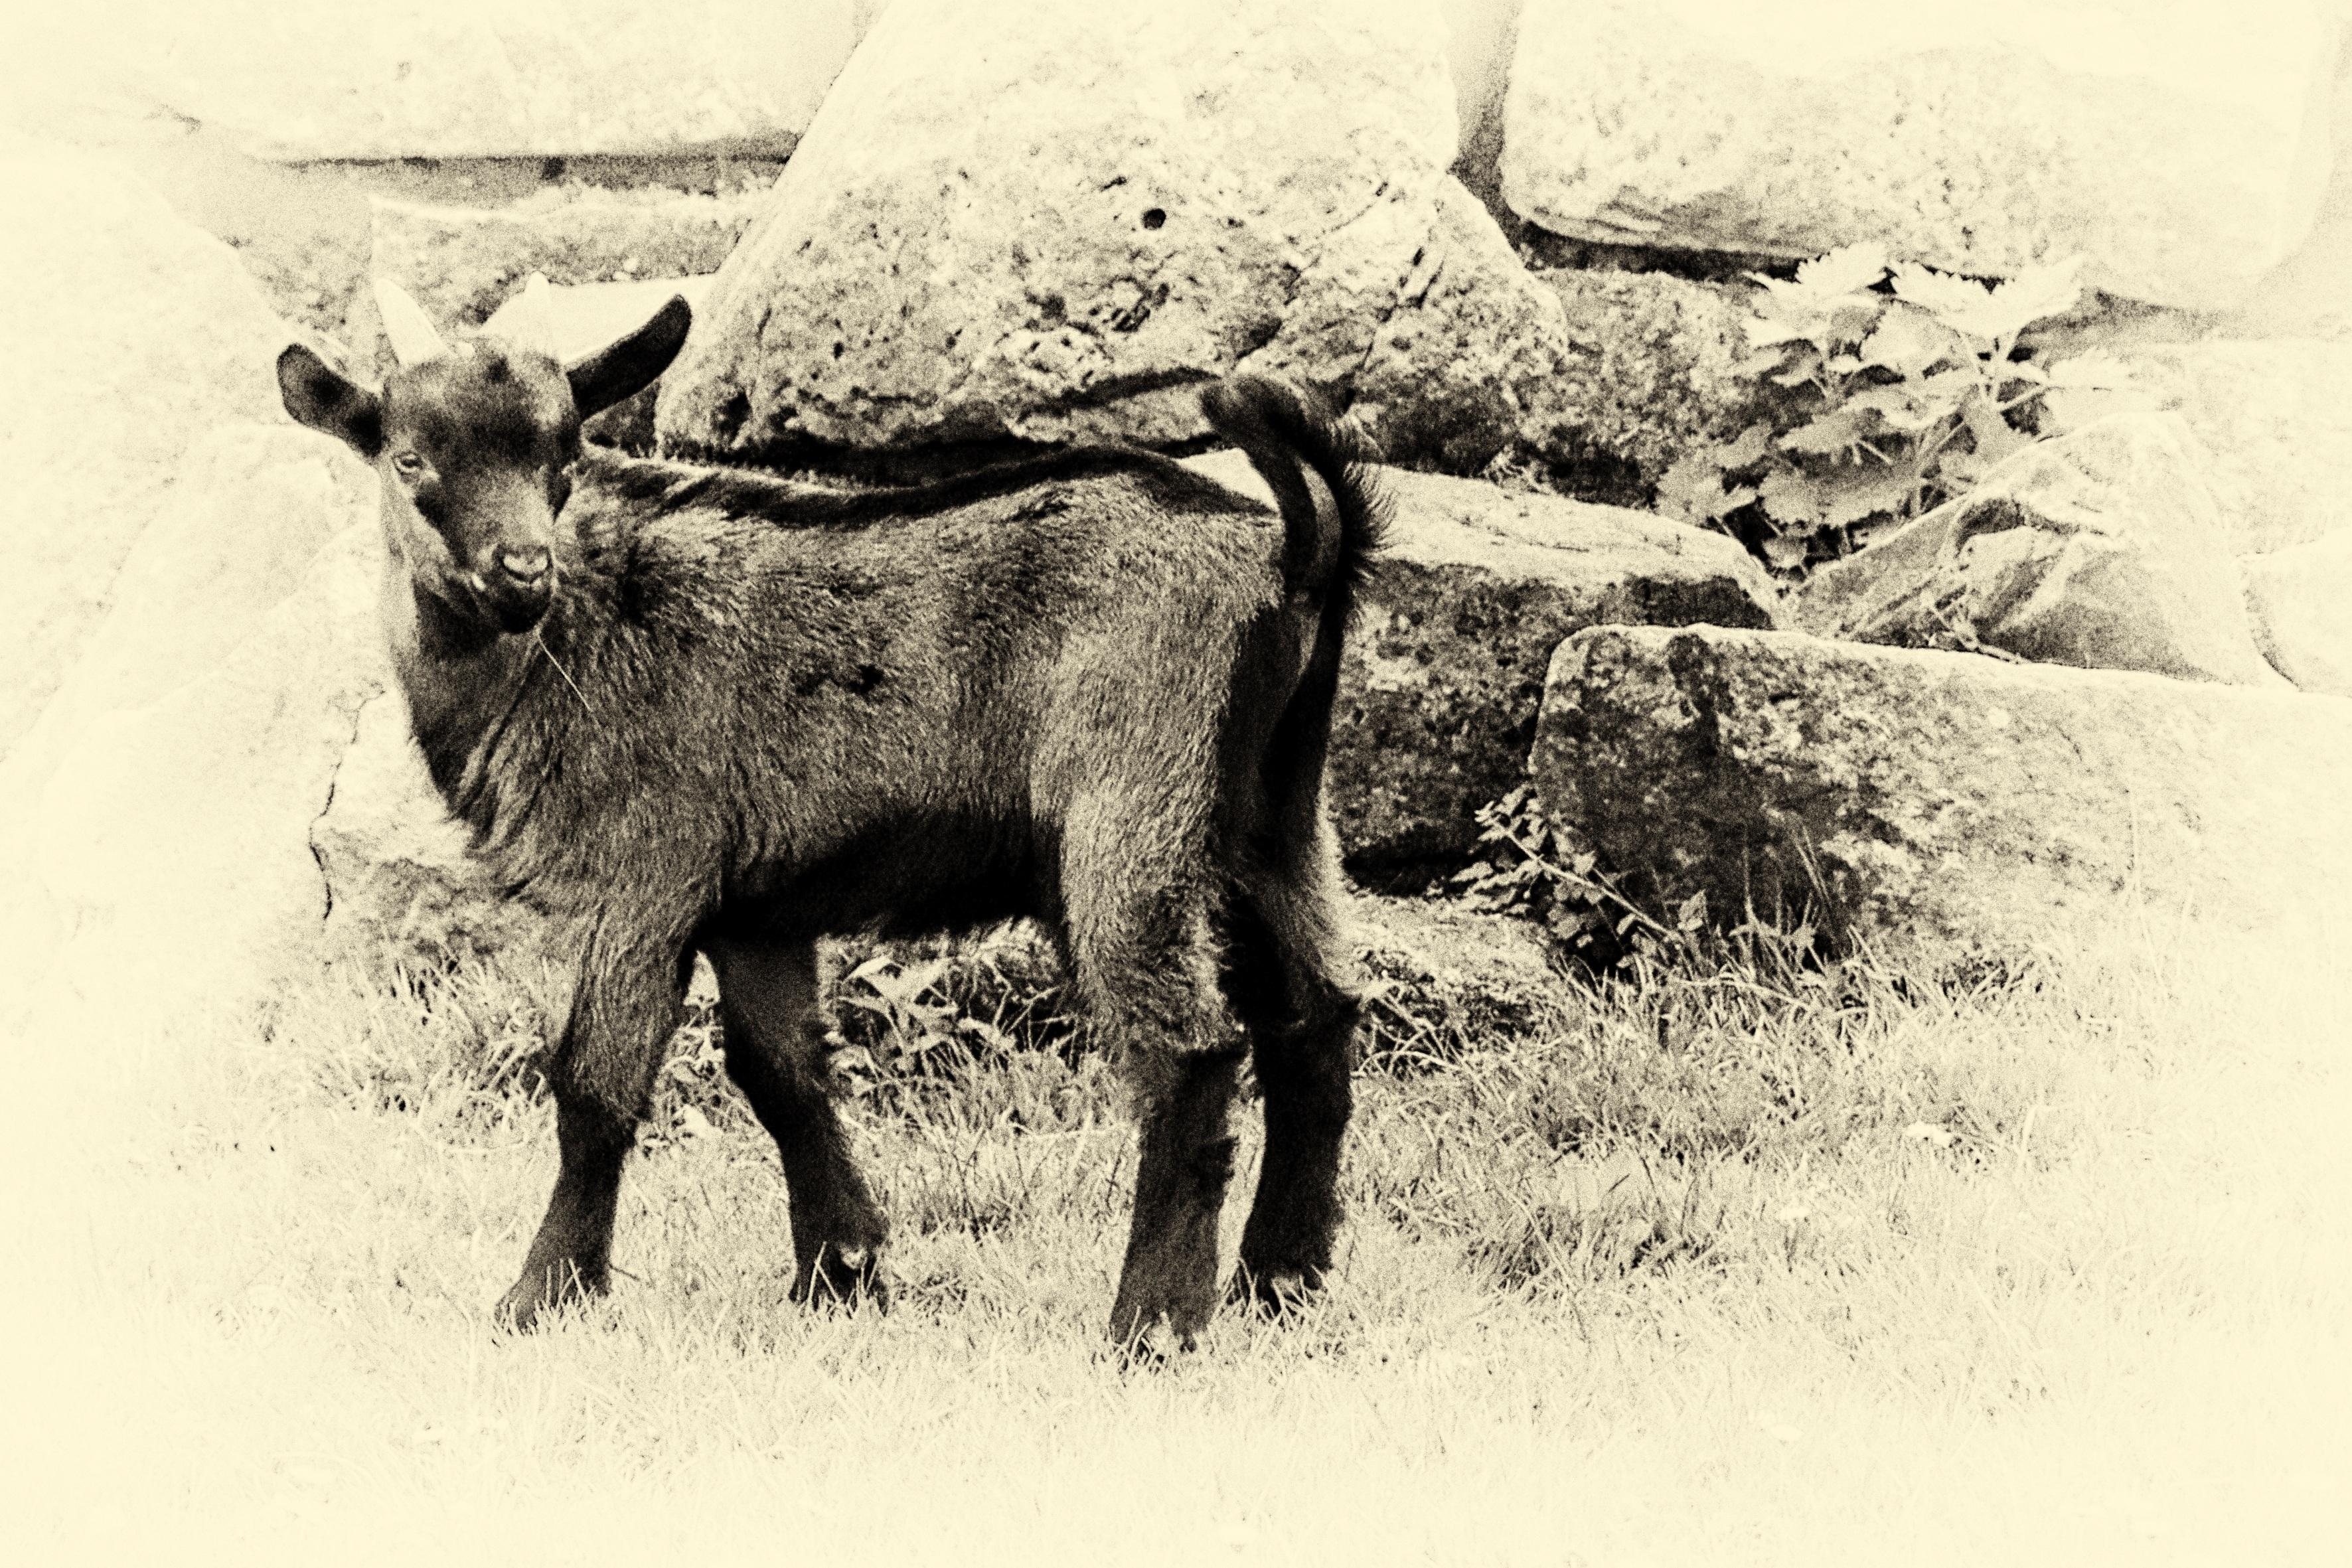 Gambar Hitam Dan Putih Domba Binatang Menyusui Satu Warna